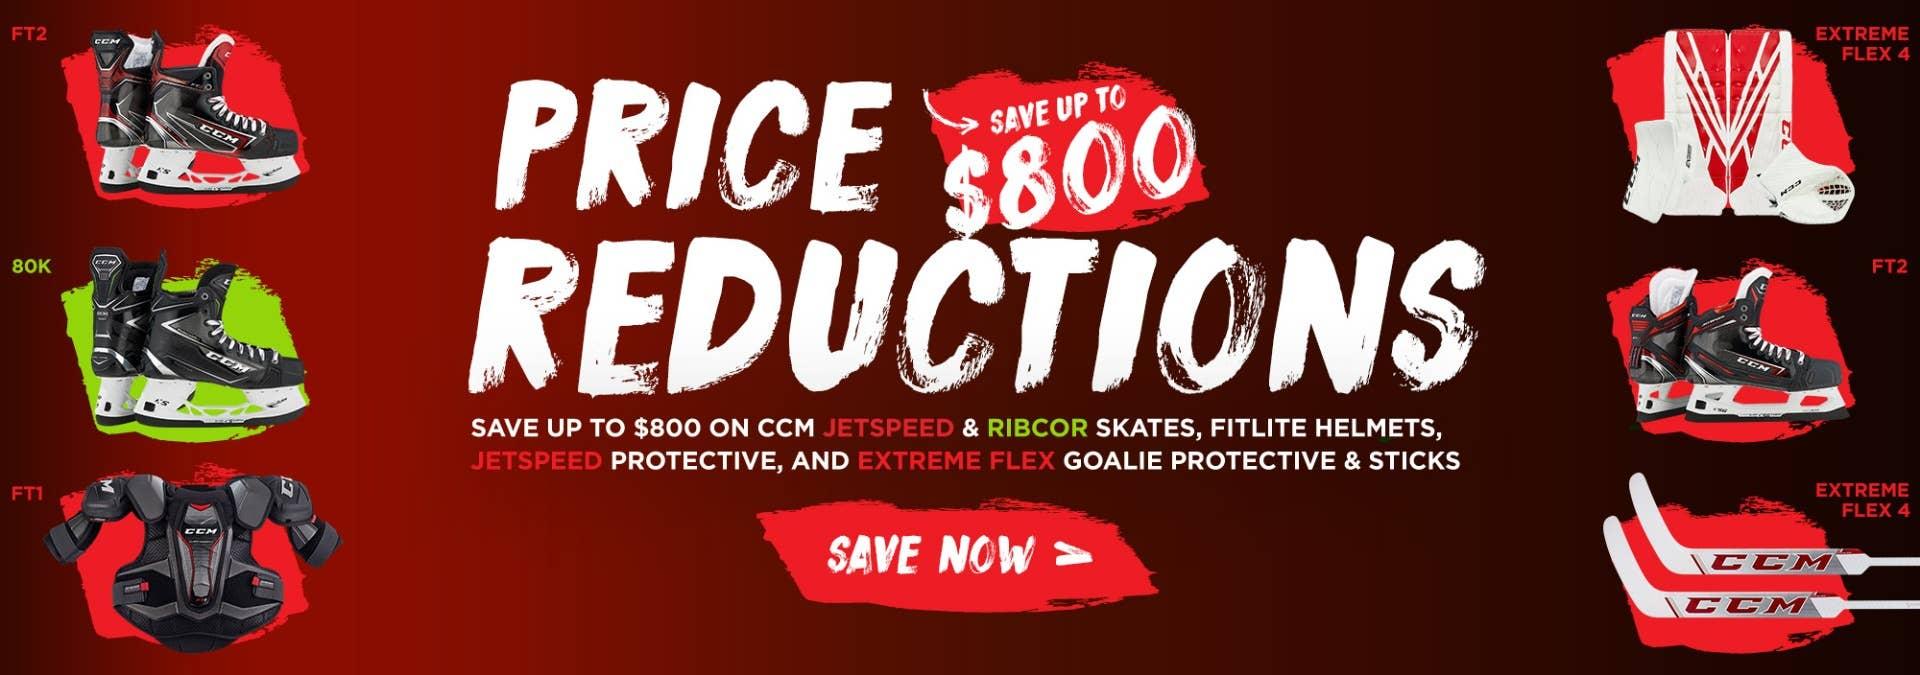 Save up to $800 on CCM JetSpeed & RibCor skates, Fitlite helmets, JetSpeed Protective, and Extreme Flex goalie protective & sticks.